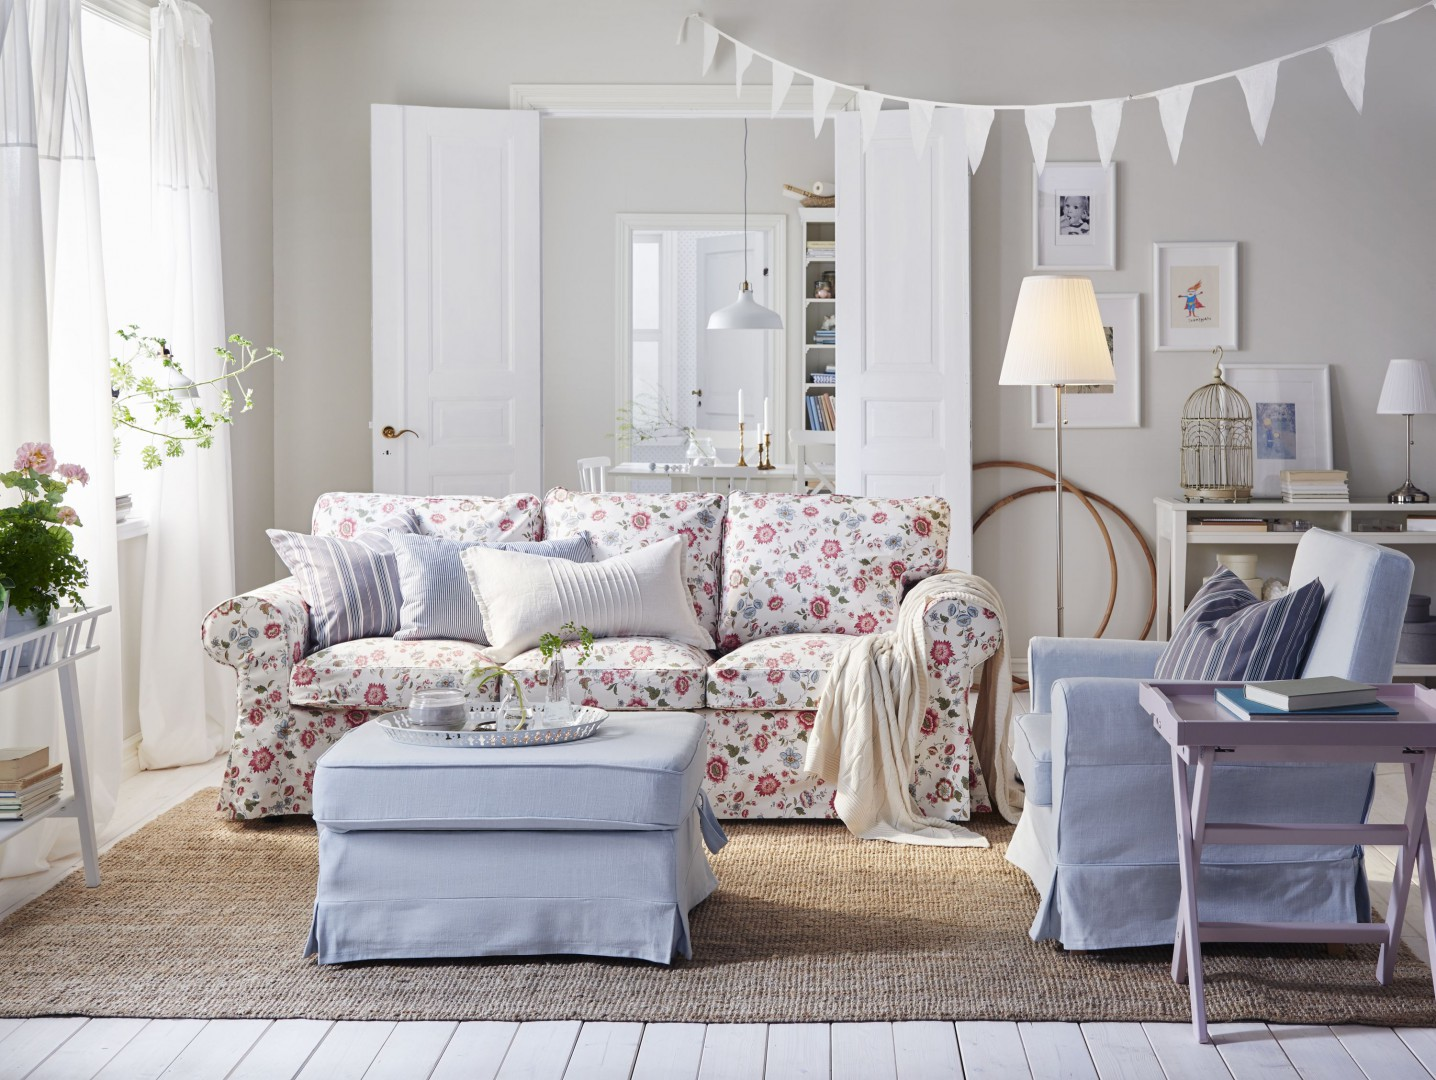 Sofa Ektorp firmy IKEA. Fot. IKEA